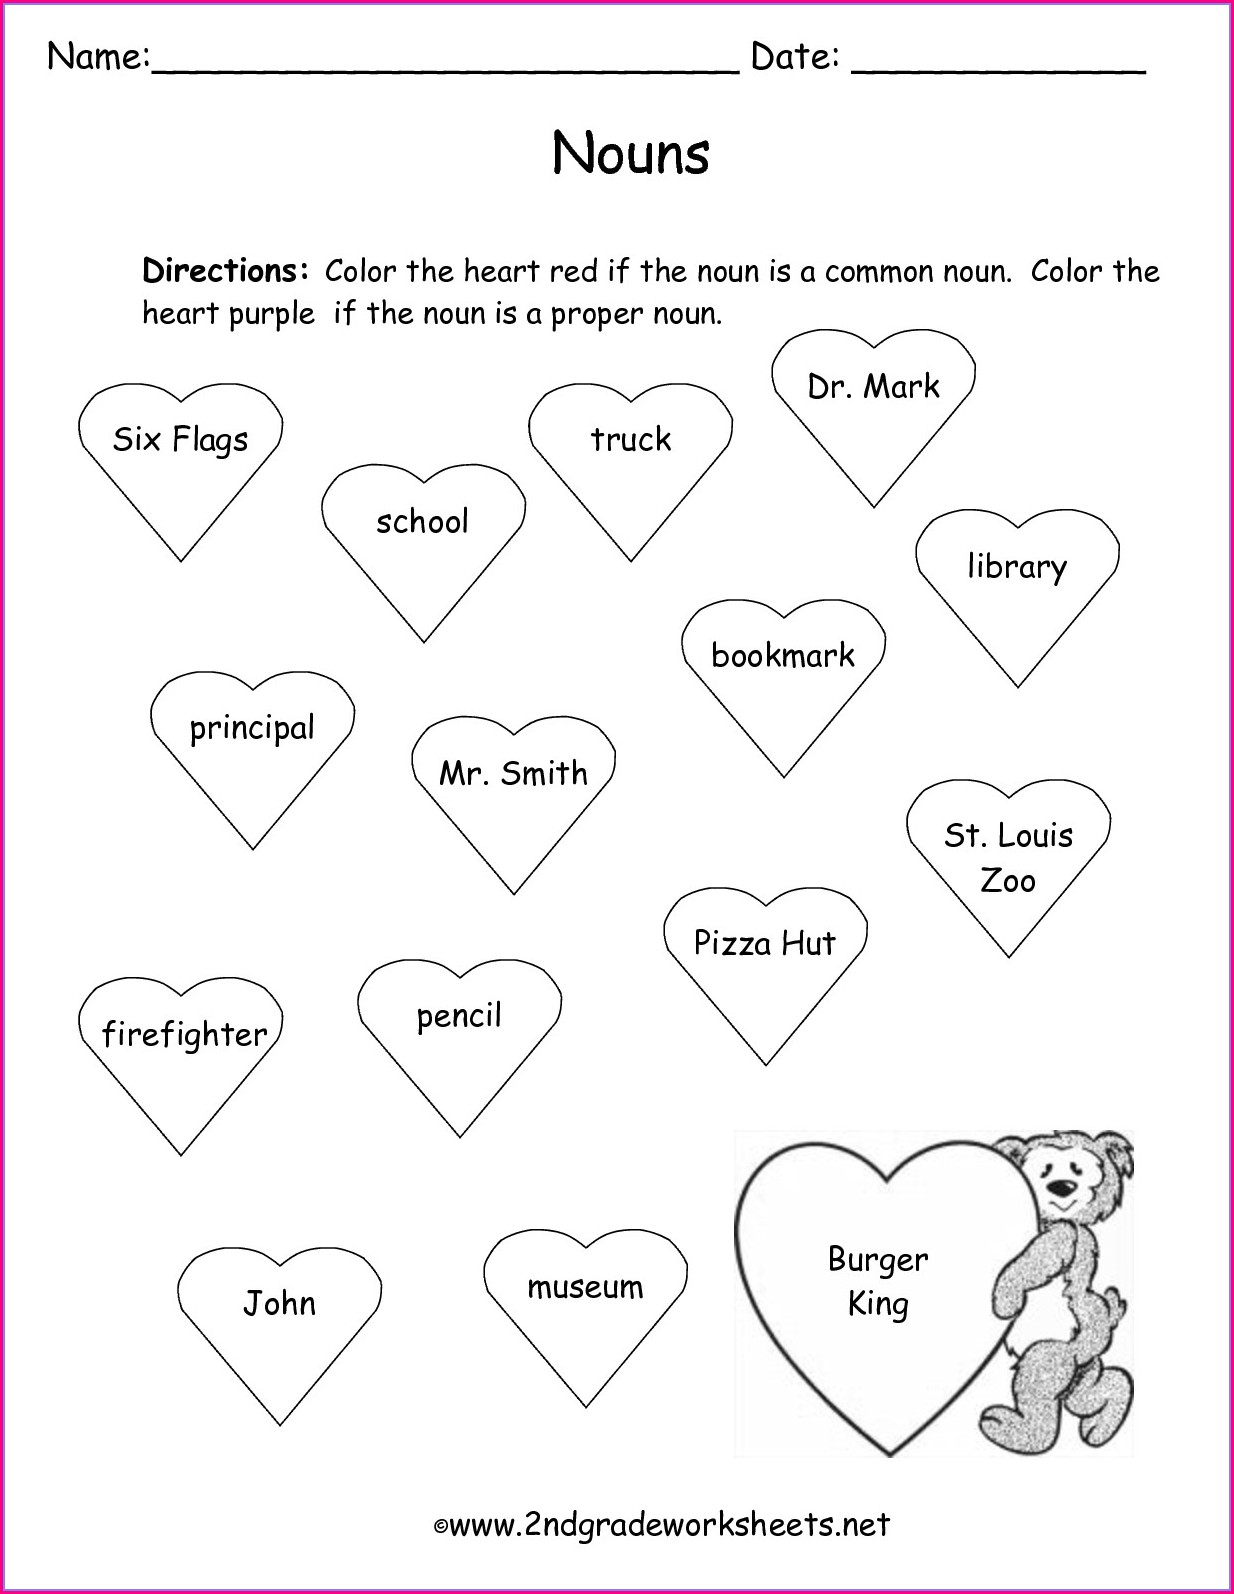 Free Printable Valentine's Day Worksheet 1st Grade